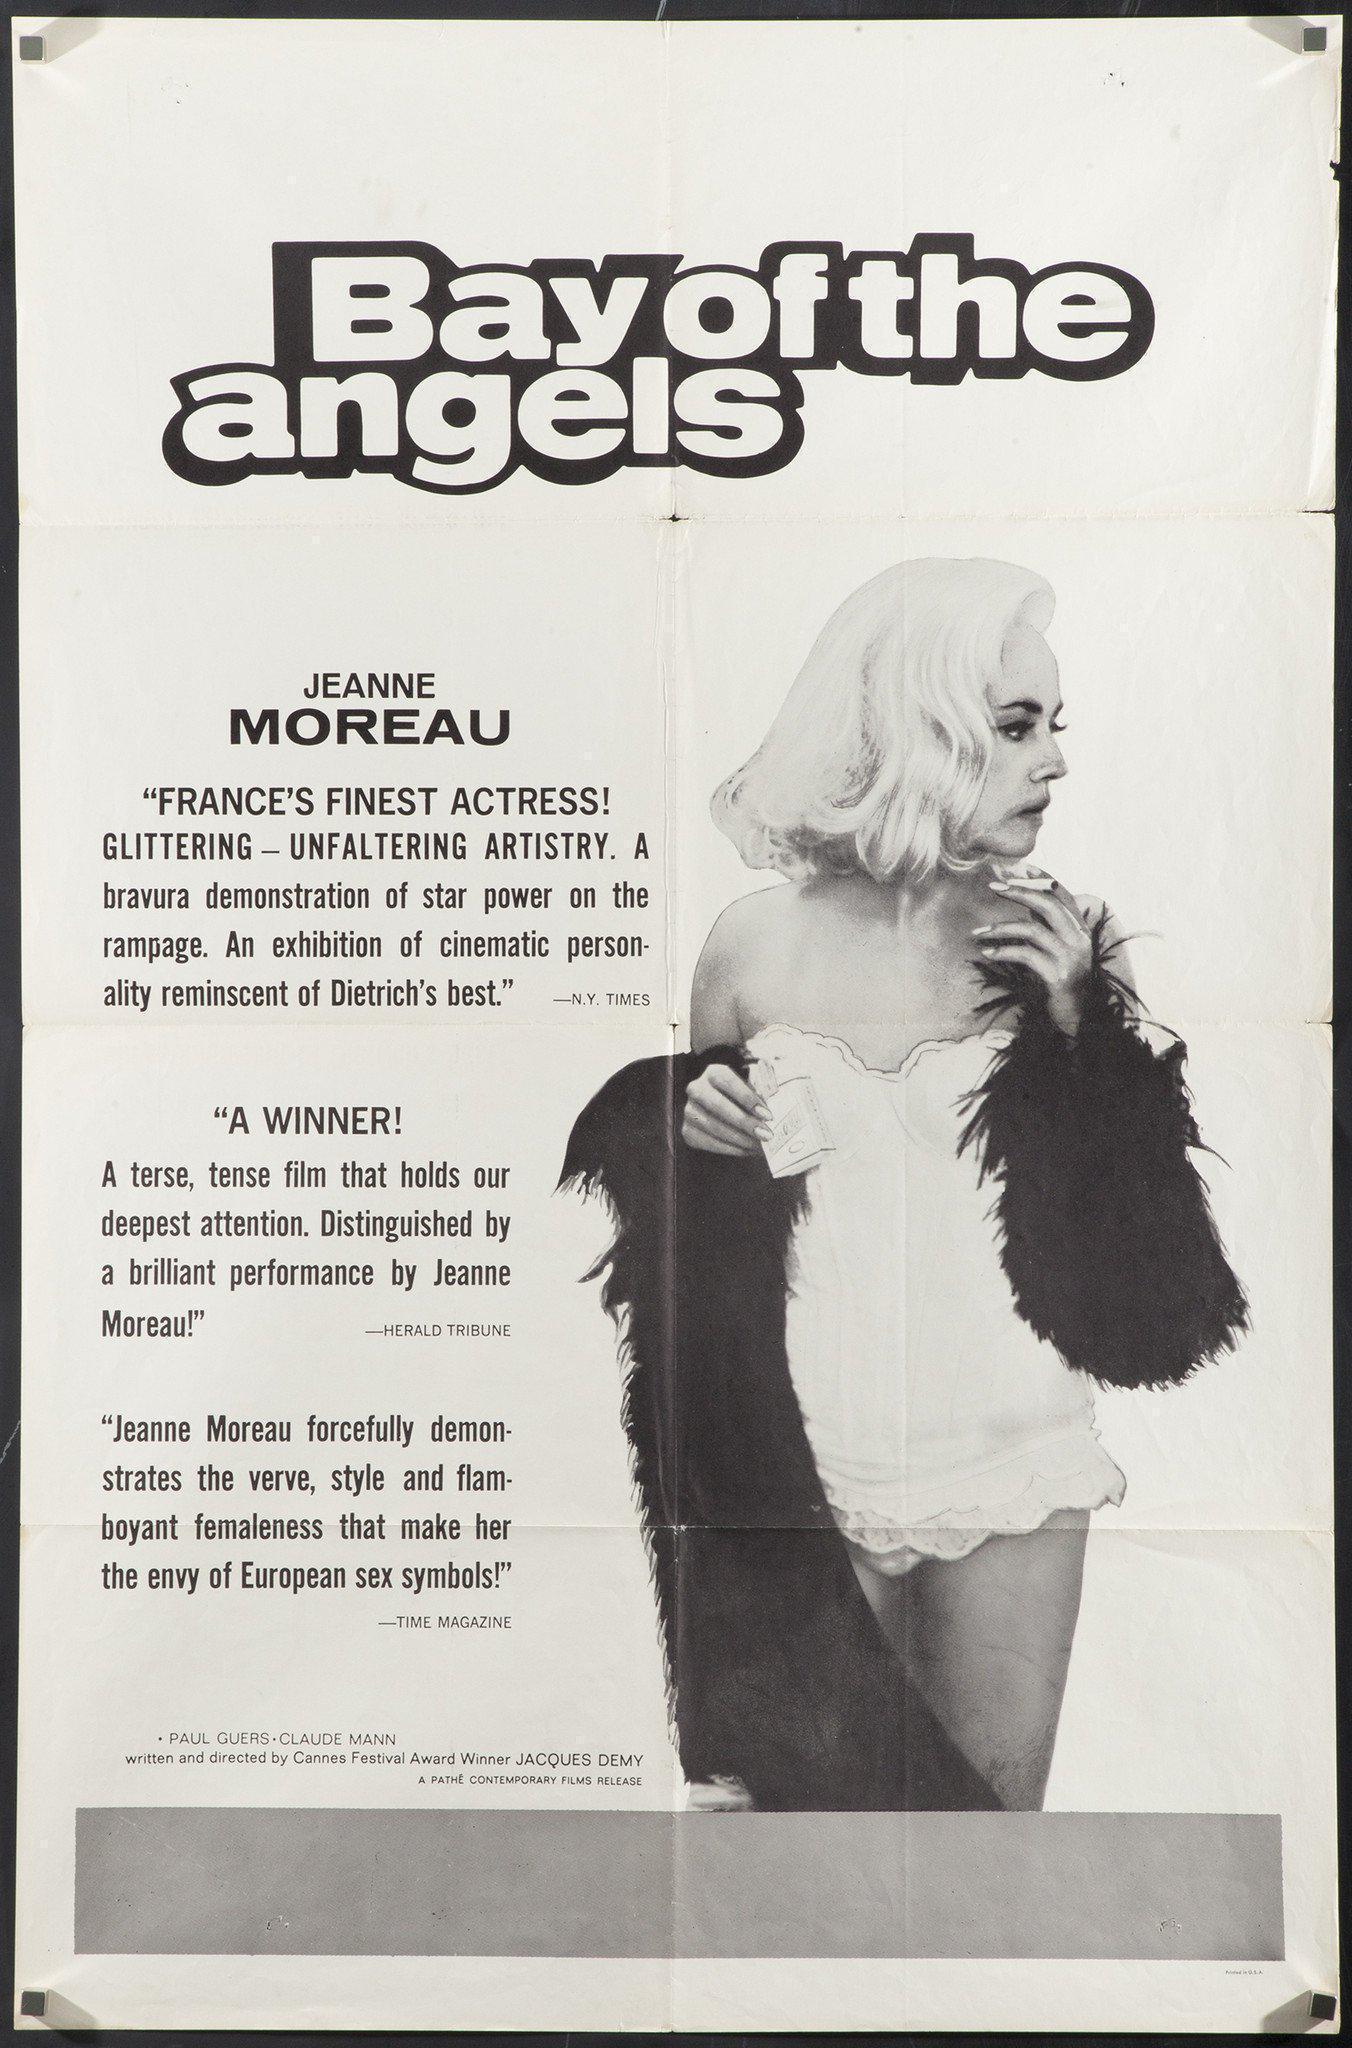 bay-of-angels-la-baie-des-anges-vintage-movie-poster-original-1-sheet-27x41-2113.jpg